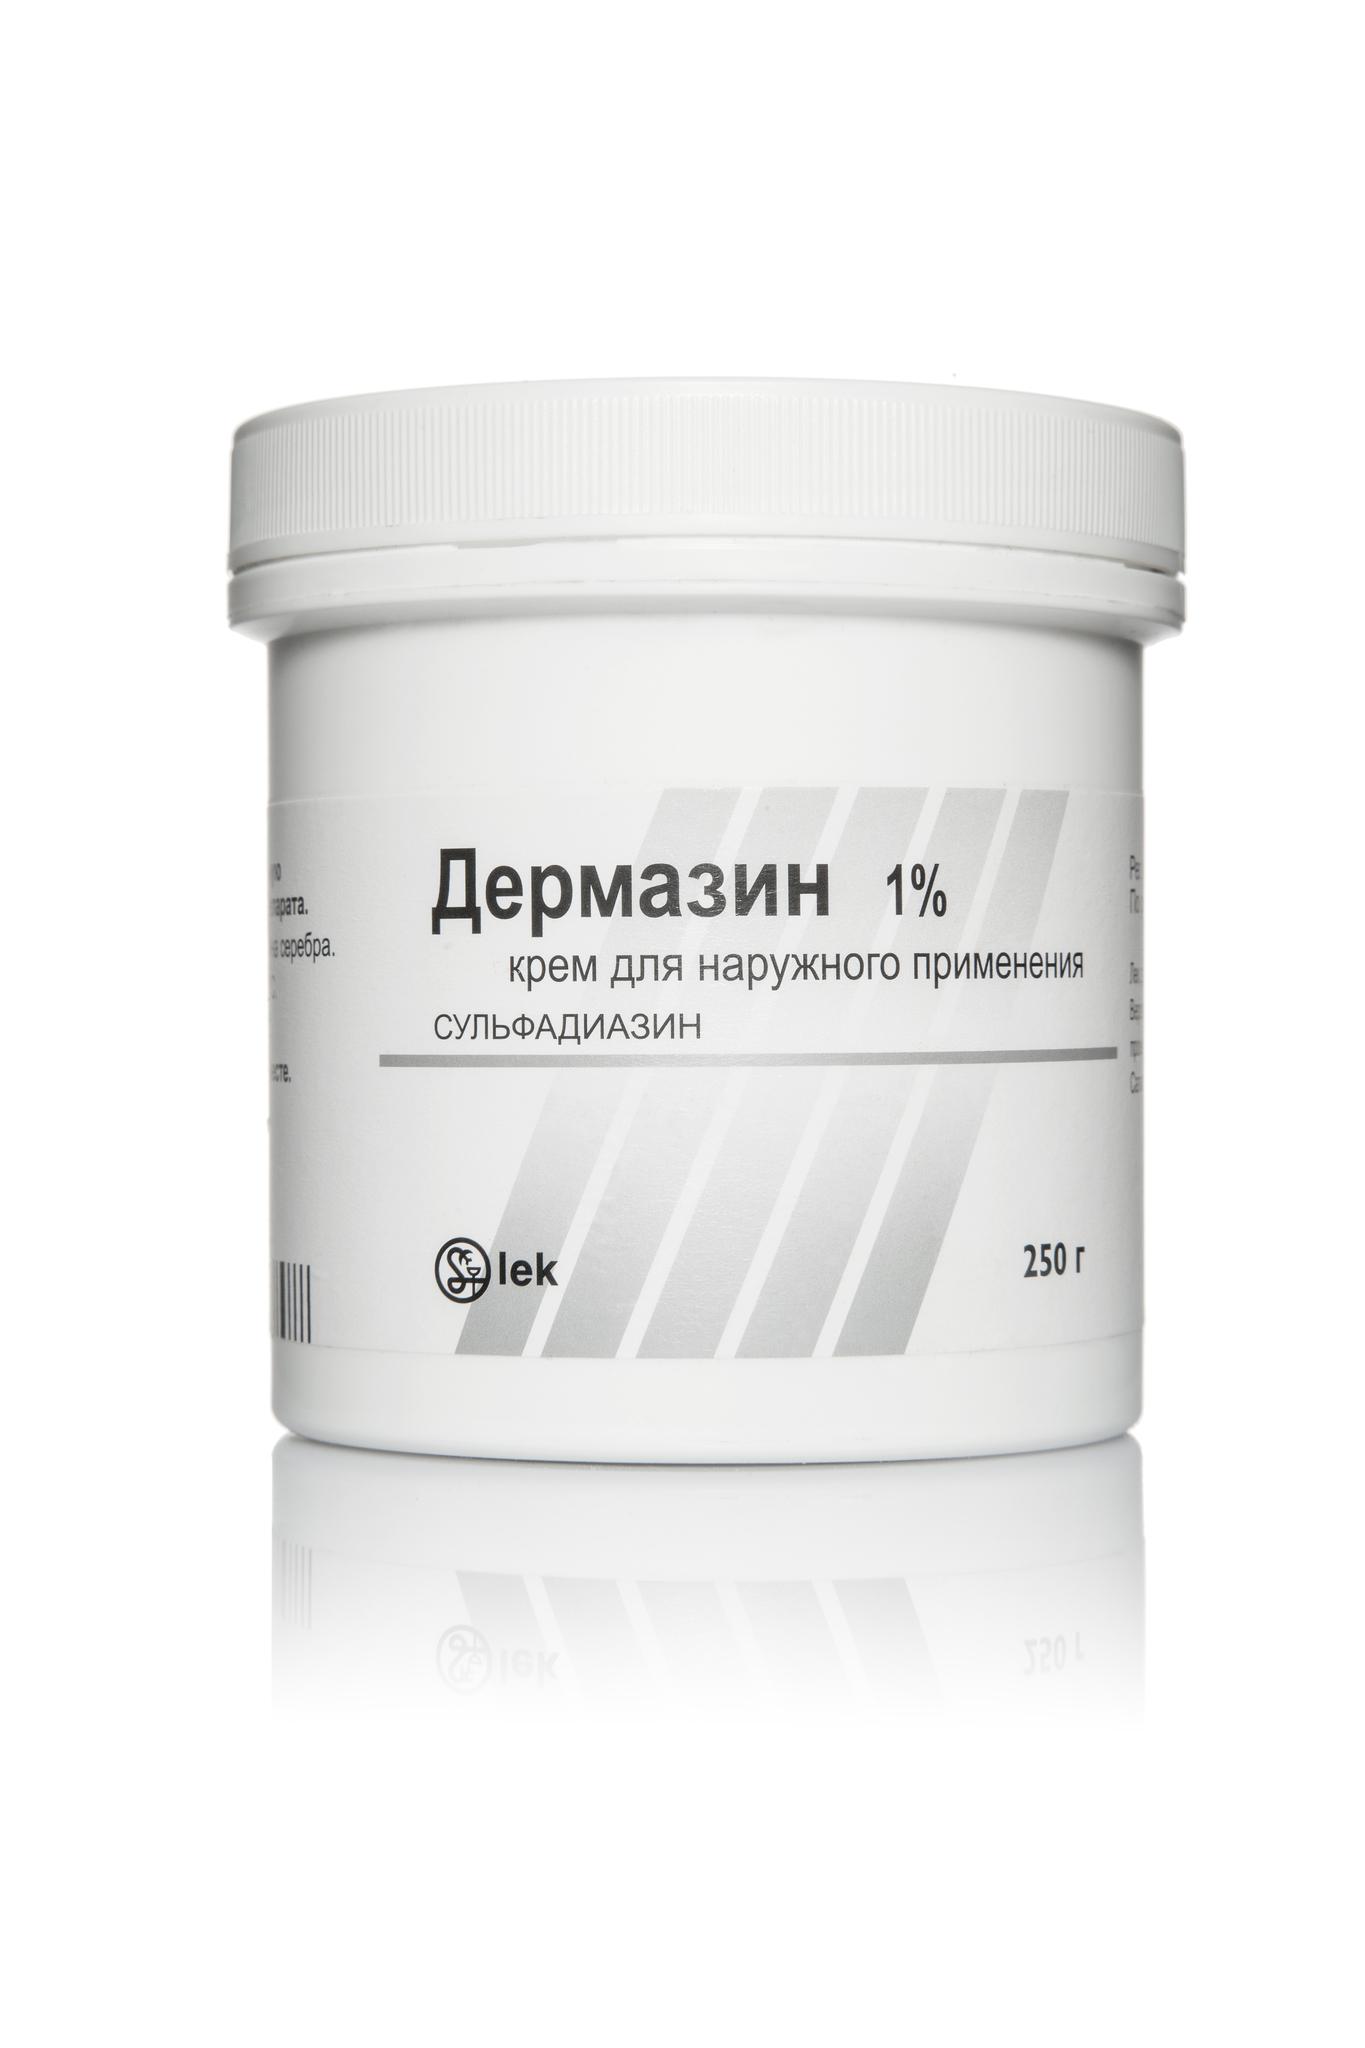 Дермазин крем 250 г.